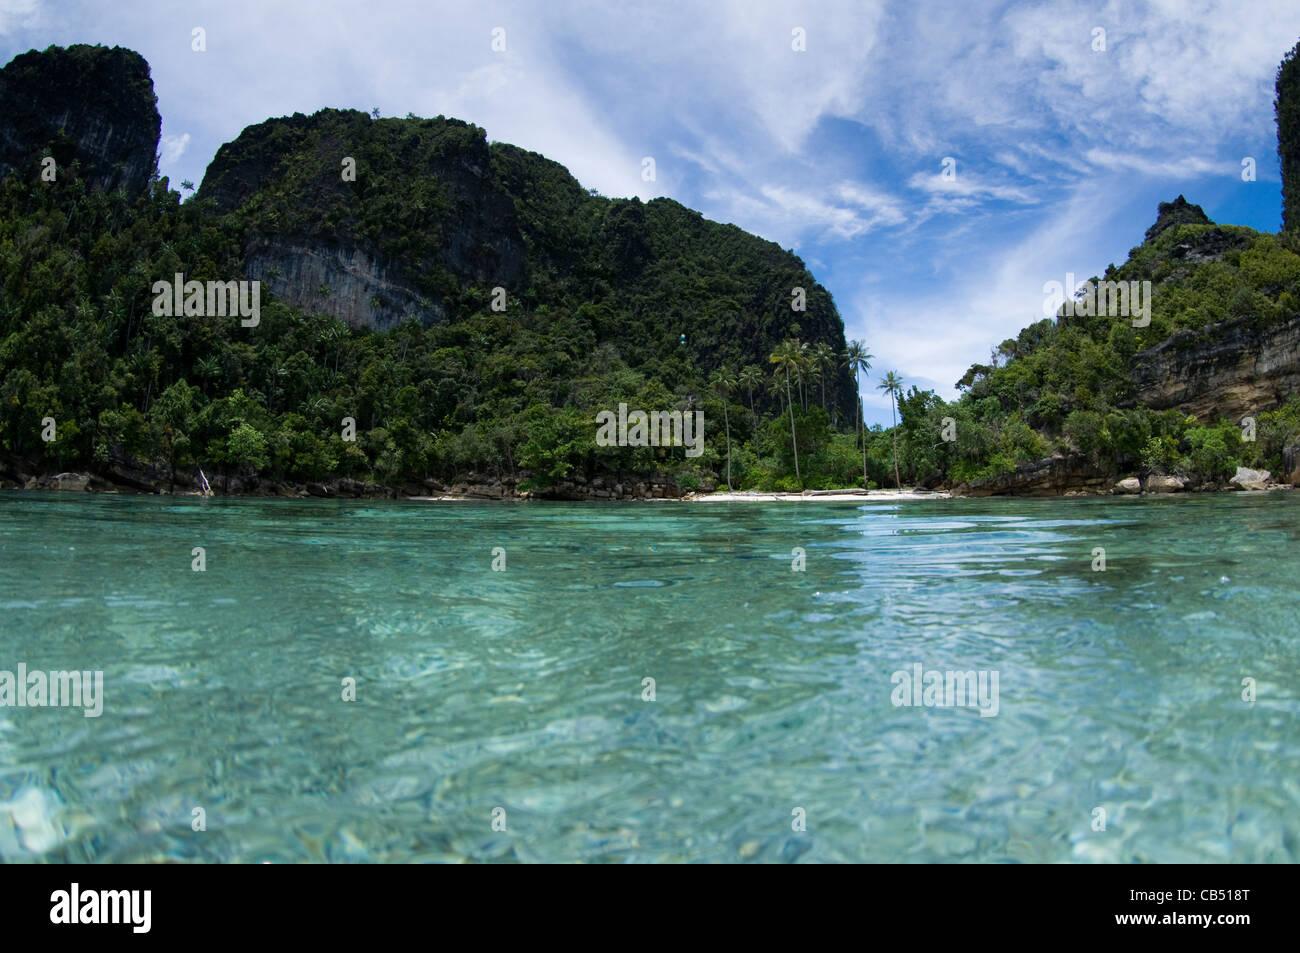 Split level photo, Misool area, Raja Ampat, West Papua, Indonesia, Pacific Ocean - Stock Image